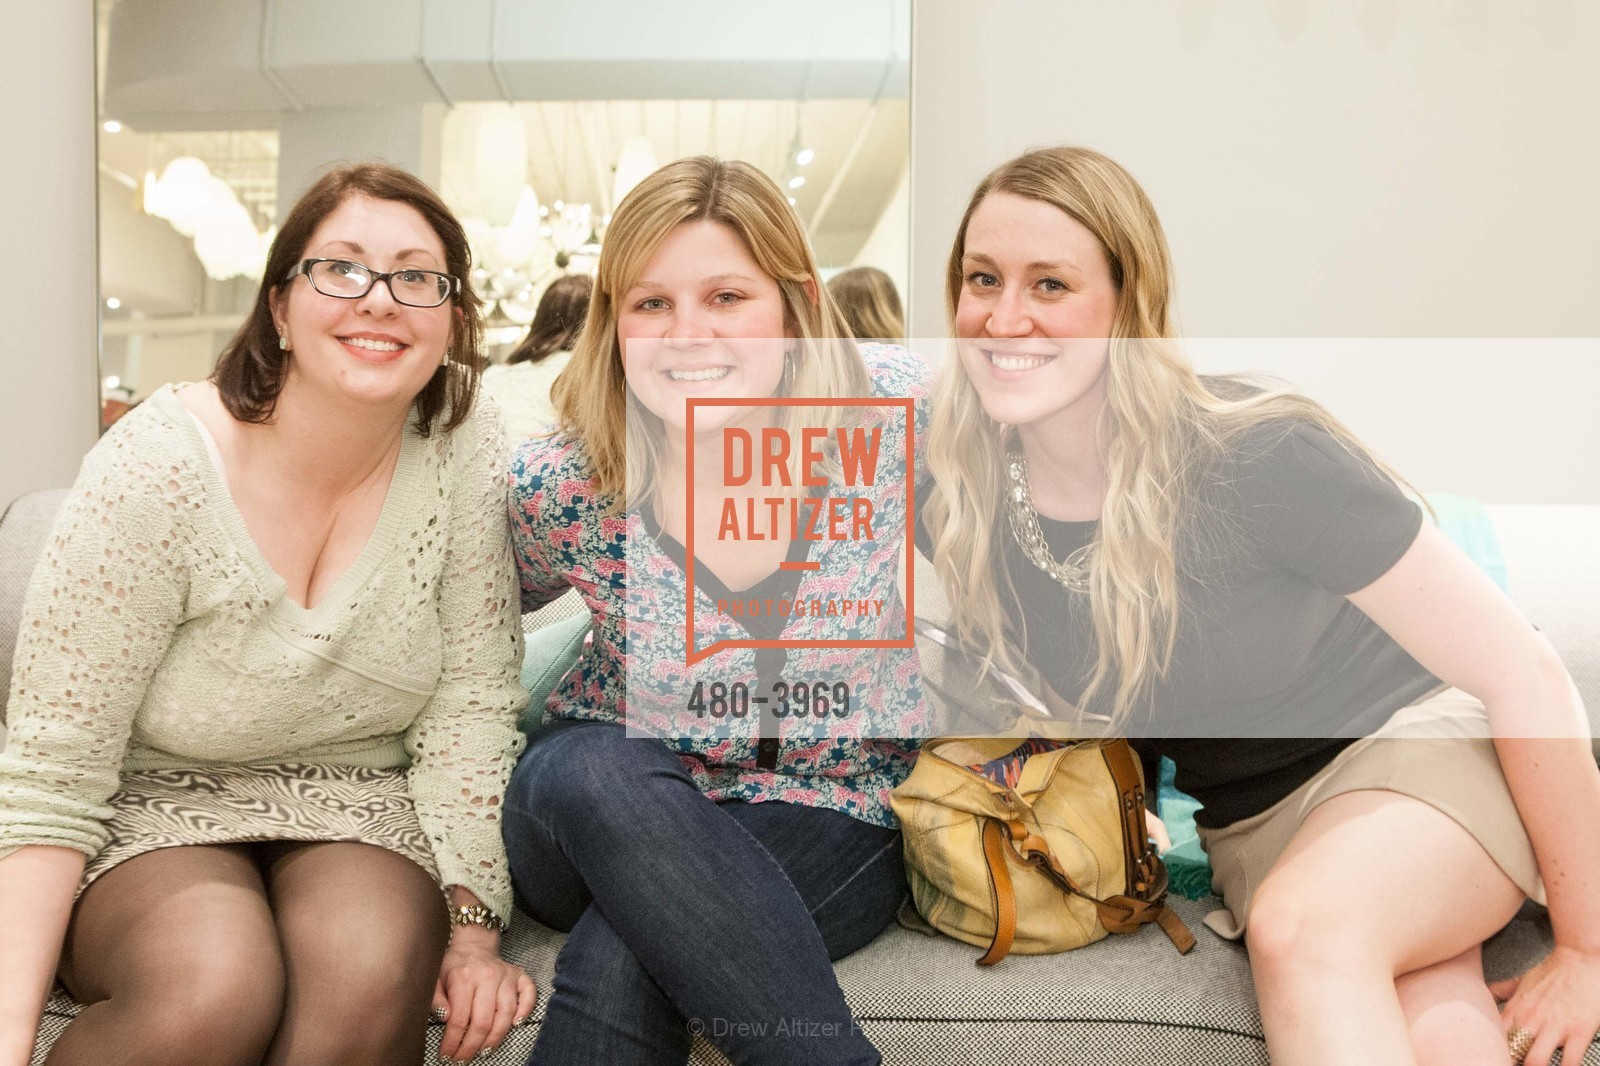 Rebekah Jatovi, Blaire Kruger, Kristin Look, Photo #480-3969